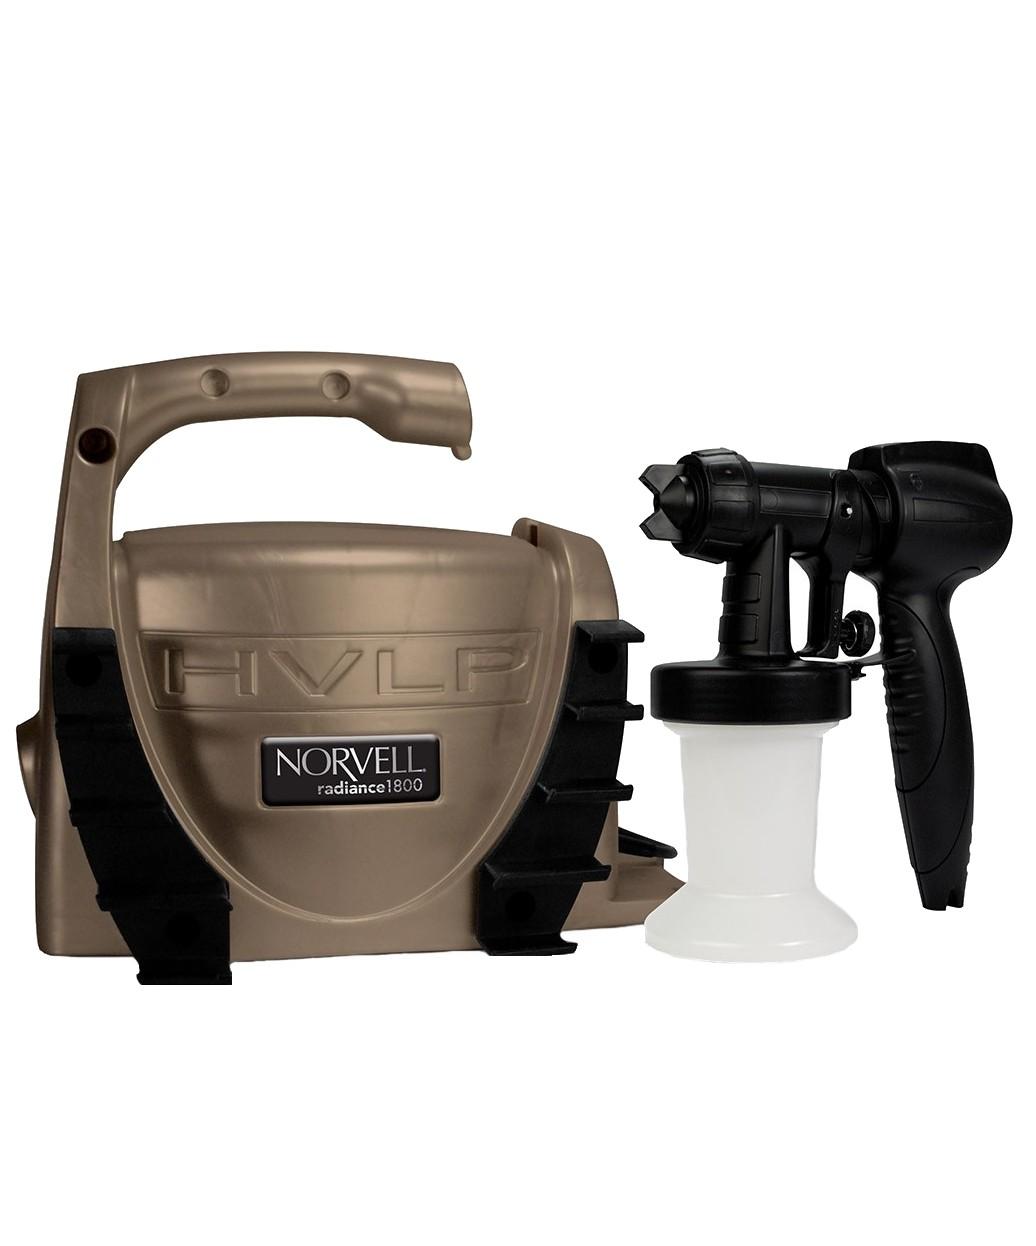 Norvell Sunless Radiance 1800 HVLP Spray System